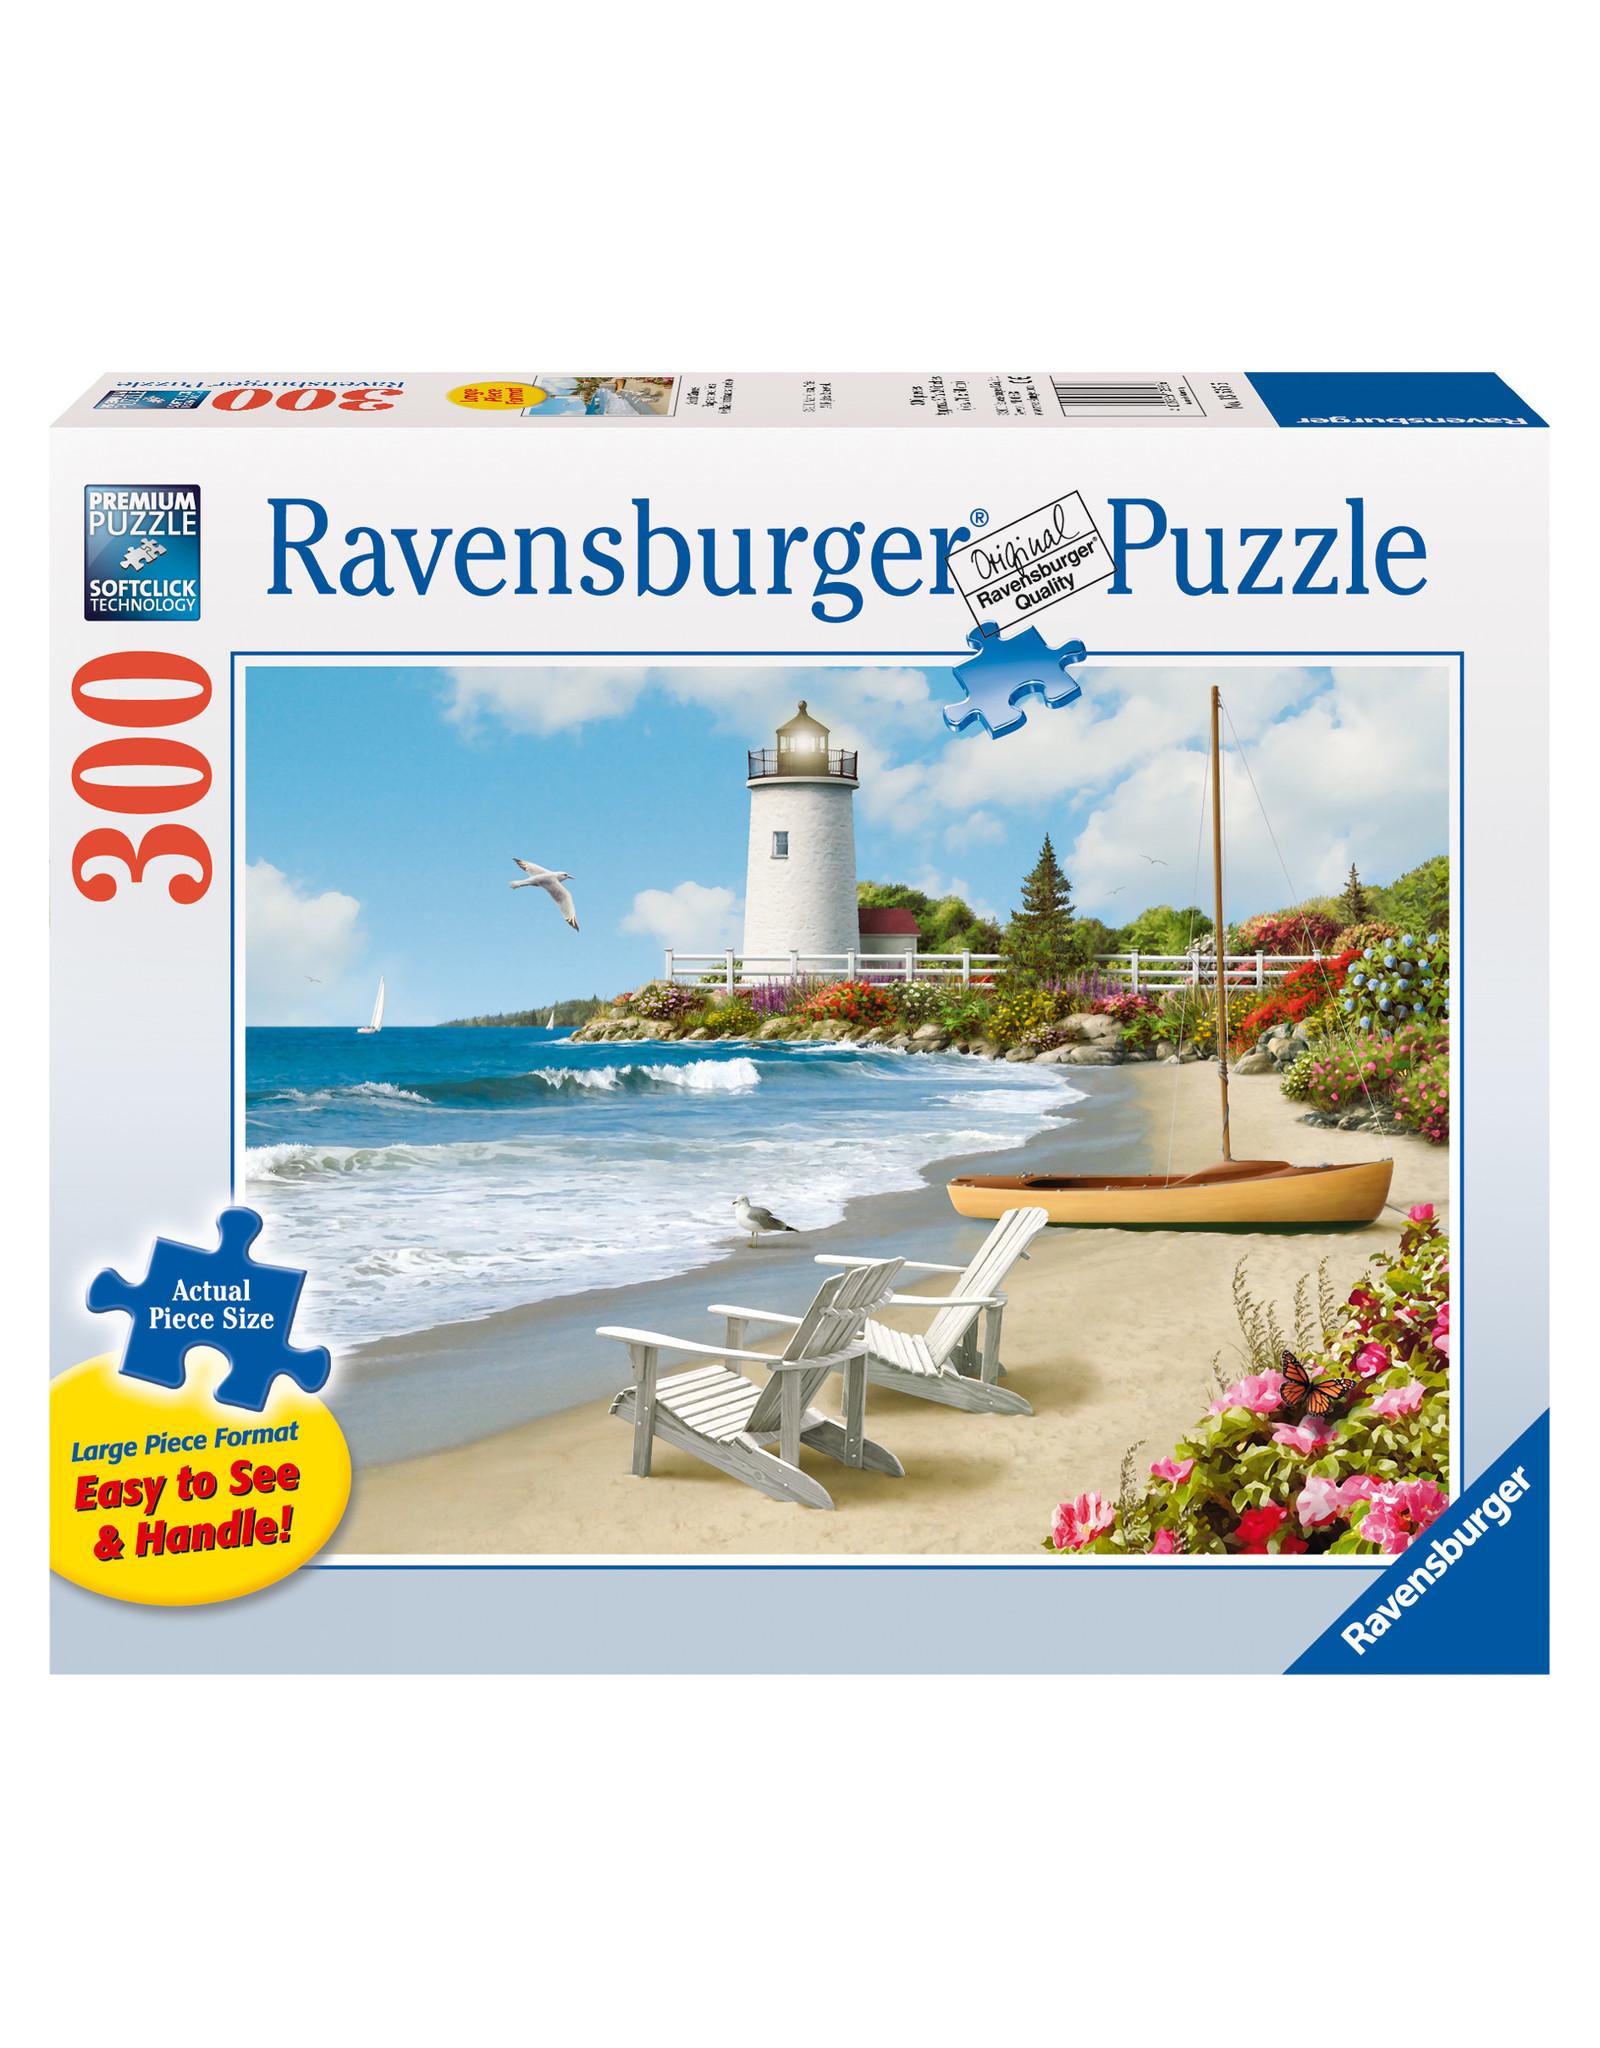 Ravensburger 300 PC SHORES